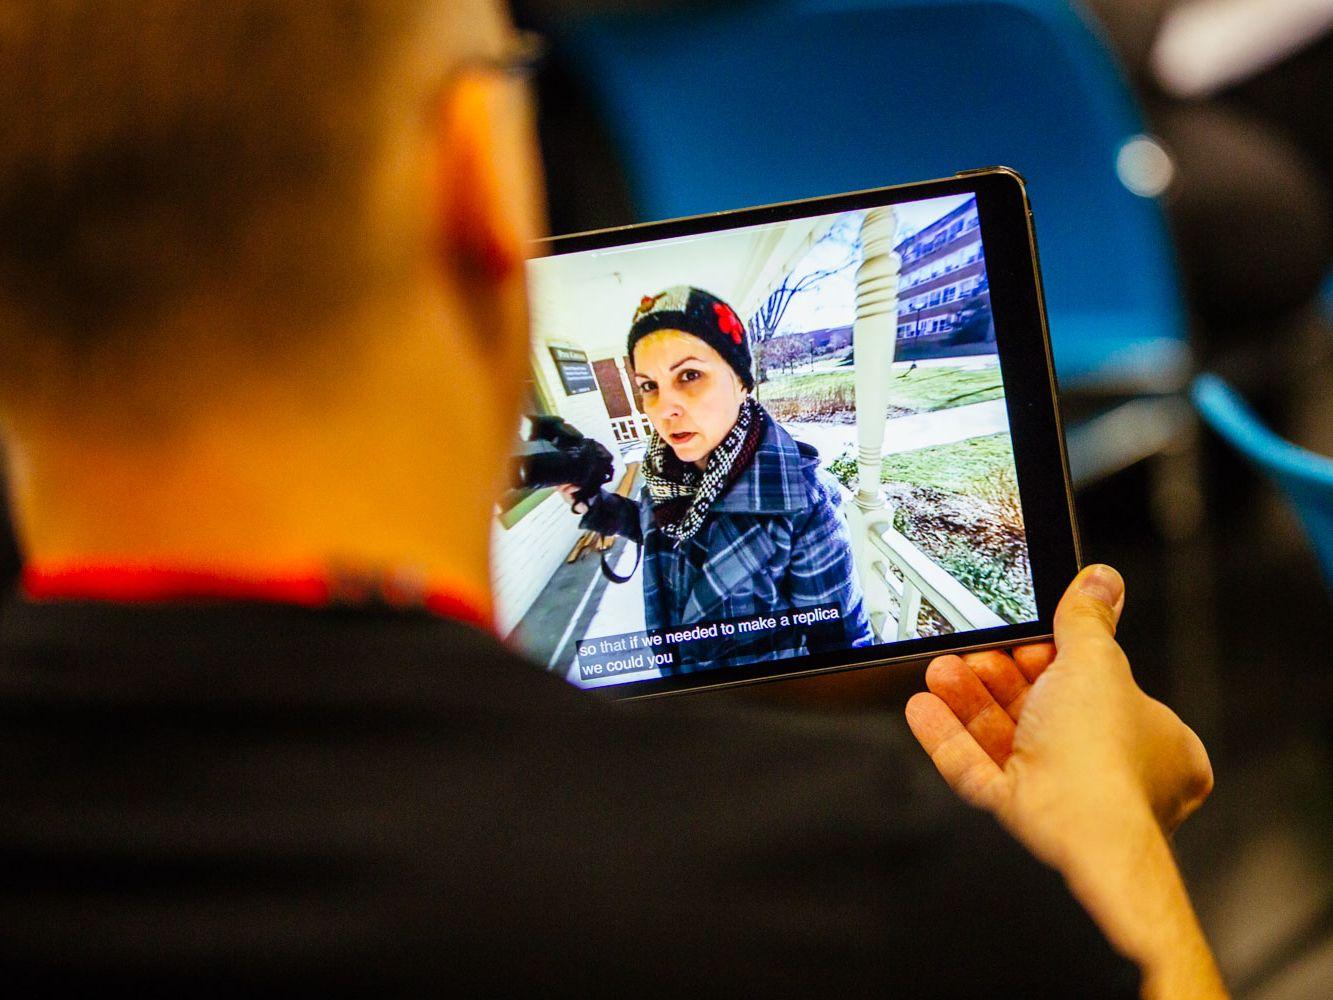 Woman holding videocamera